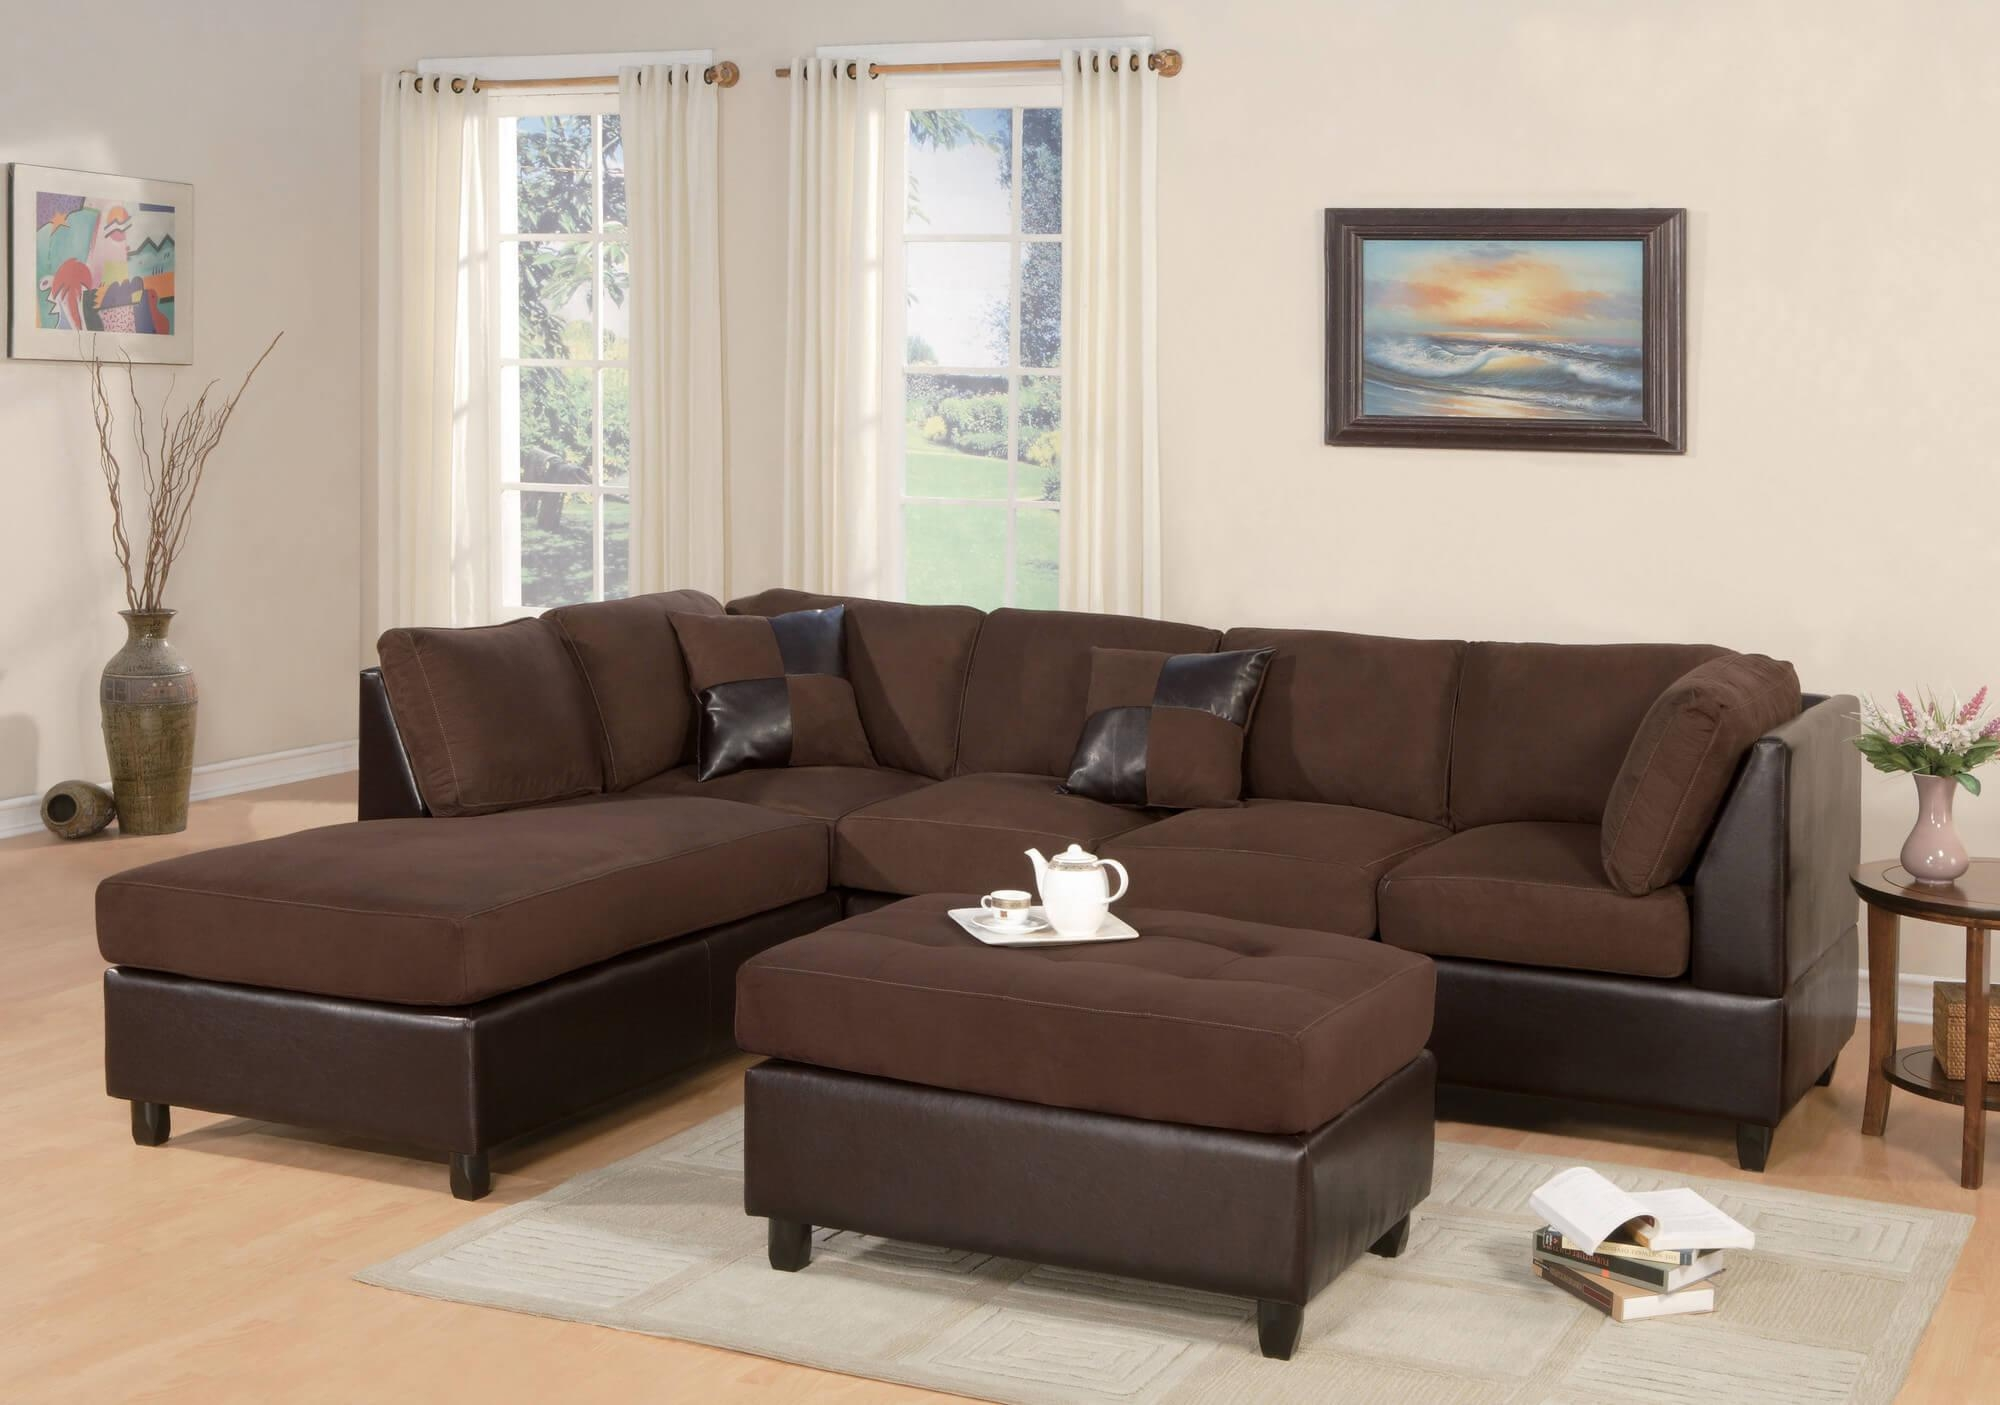 Sofas Center : Sofa Sleeper Atg Lots Furniture Sofas For Sale And Regarding Big Lots Sofa Sleeper (Image 17 of 20)